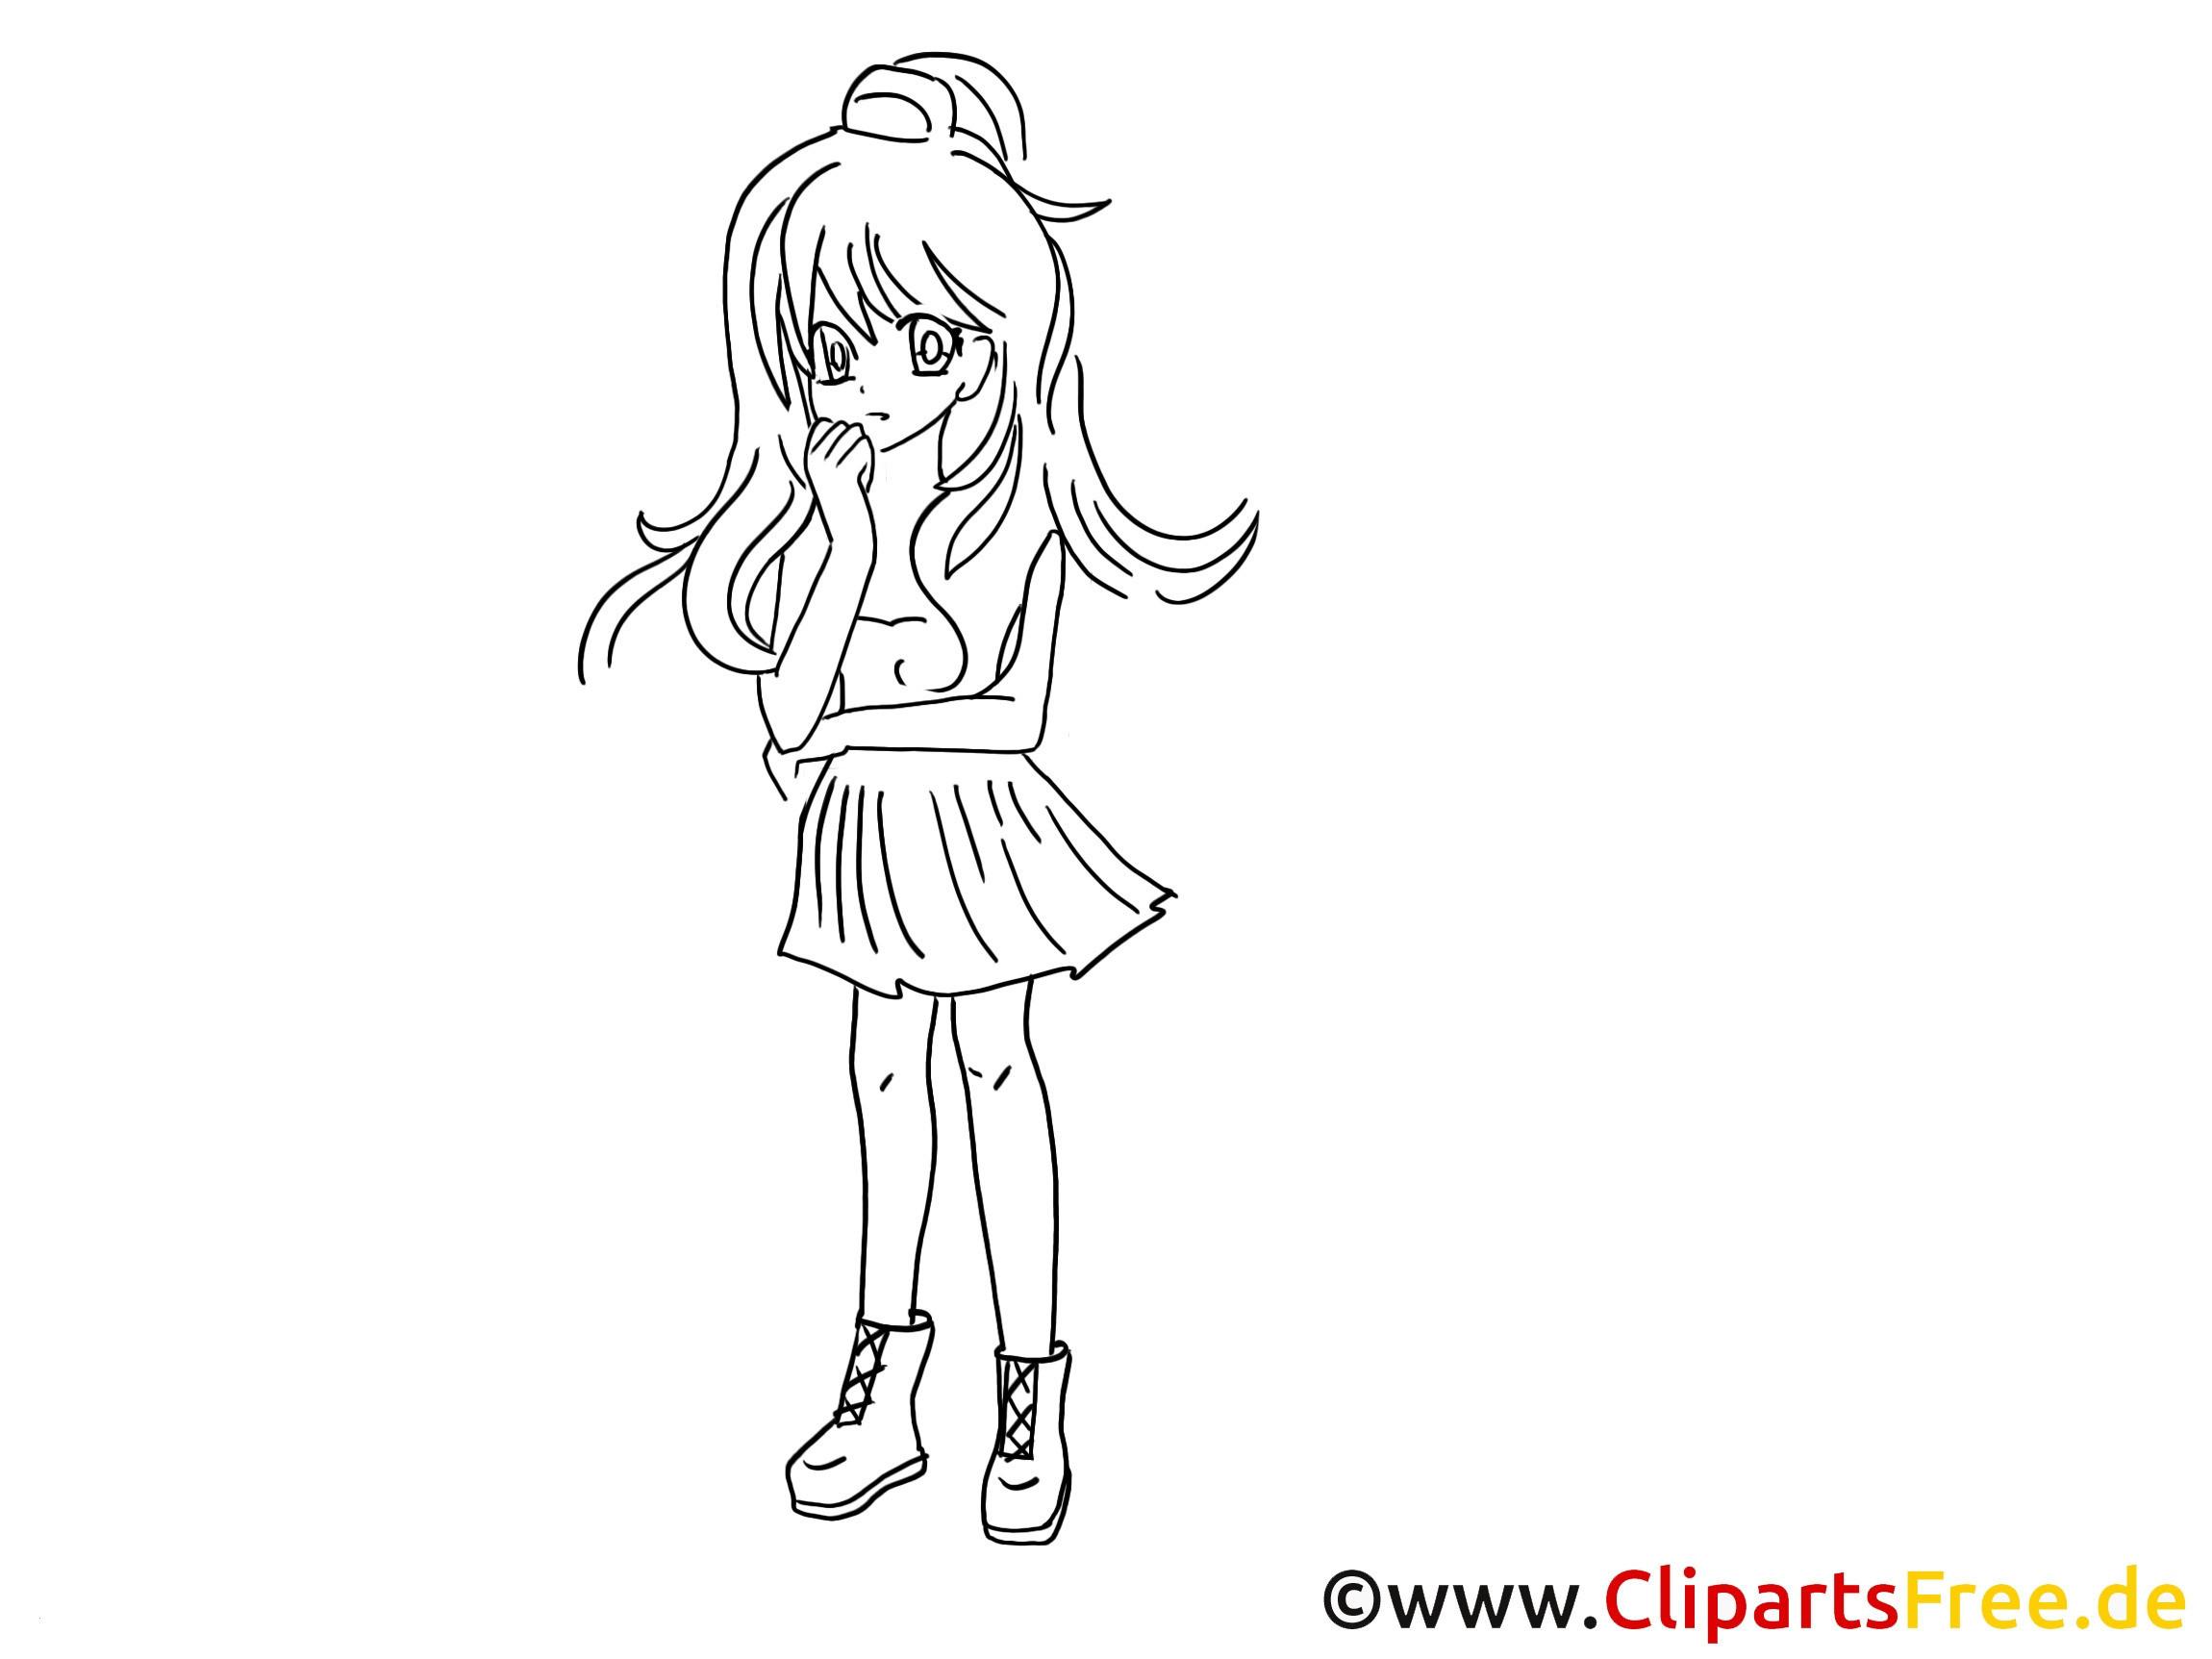 Anime Engel Ausmalbilder Genial Ausmalbilder Anime Und Manga